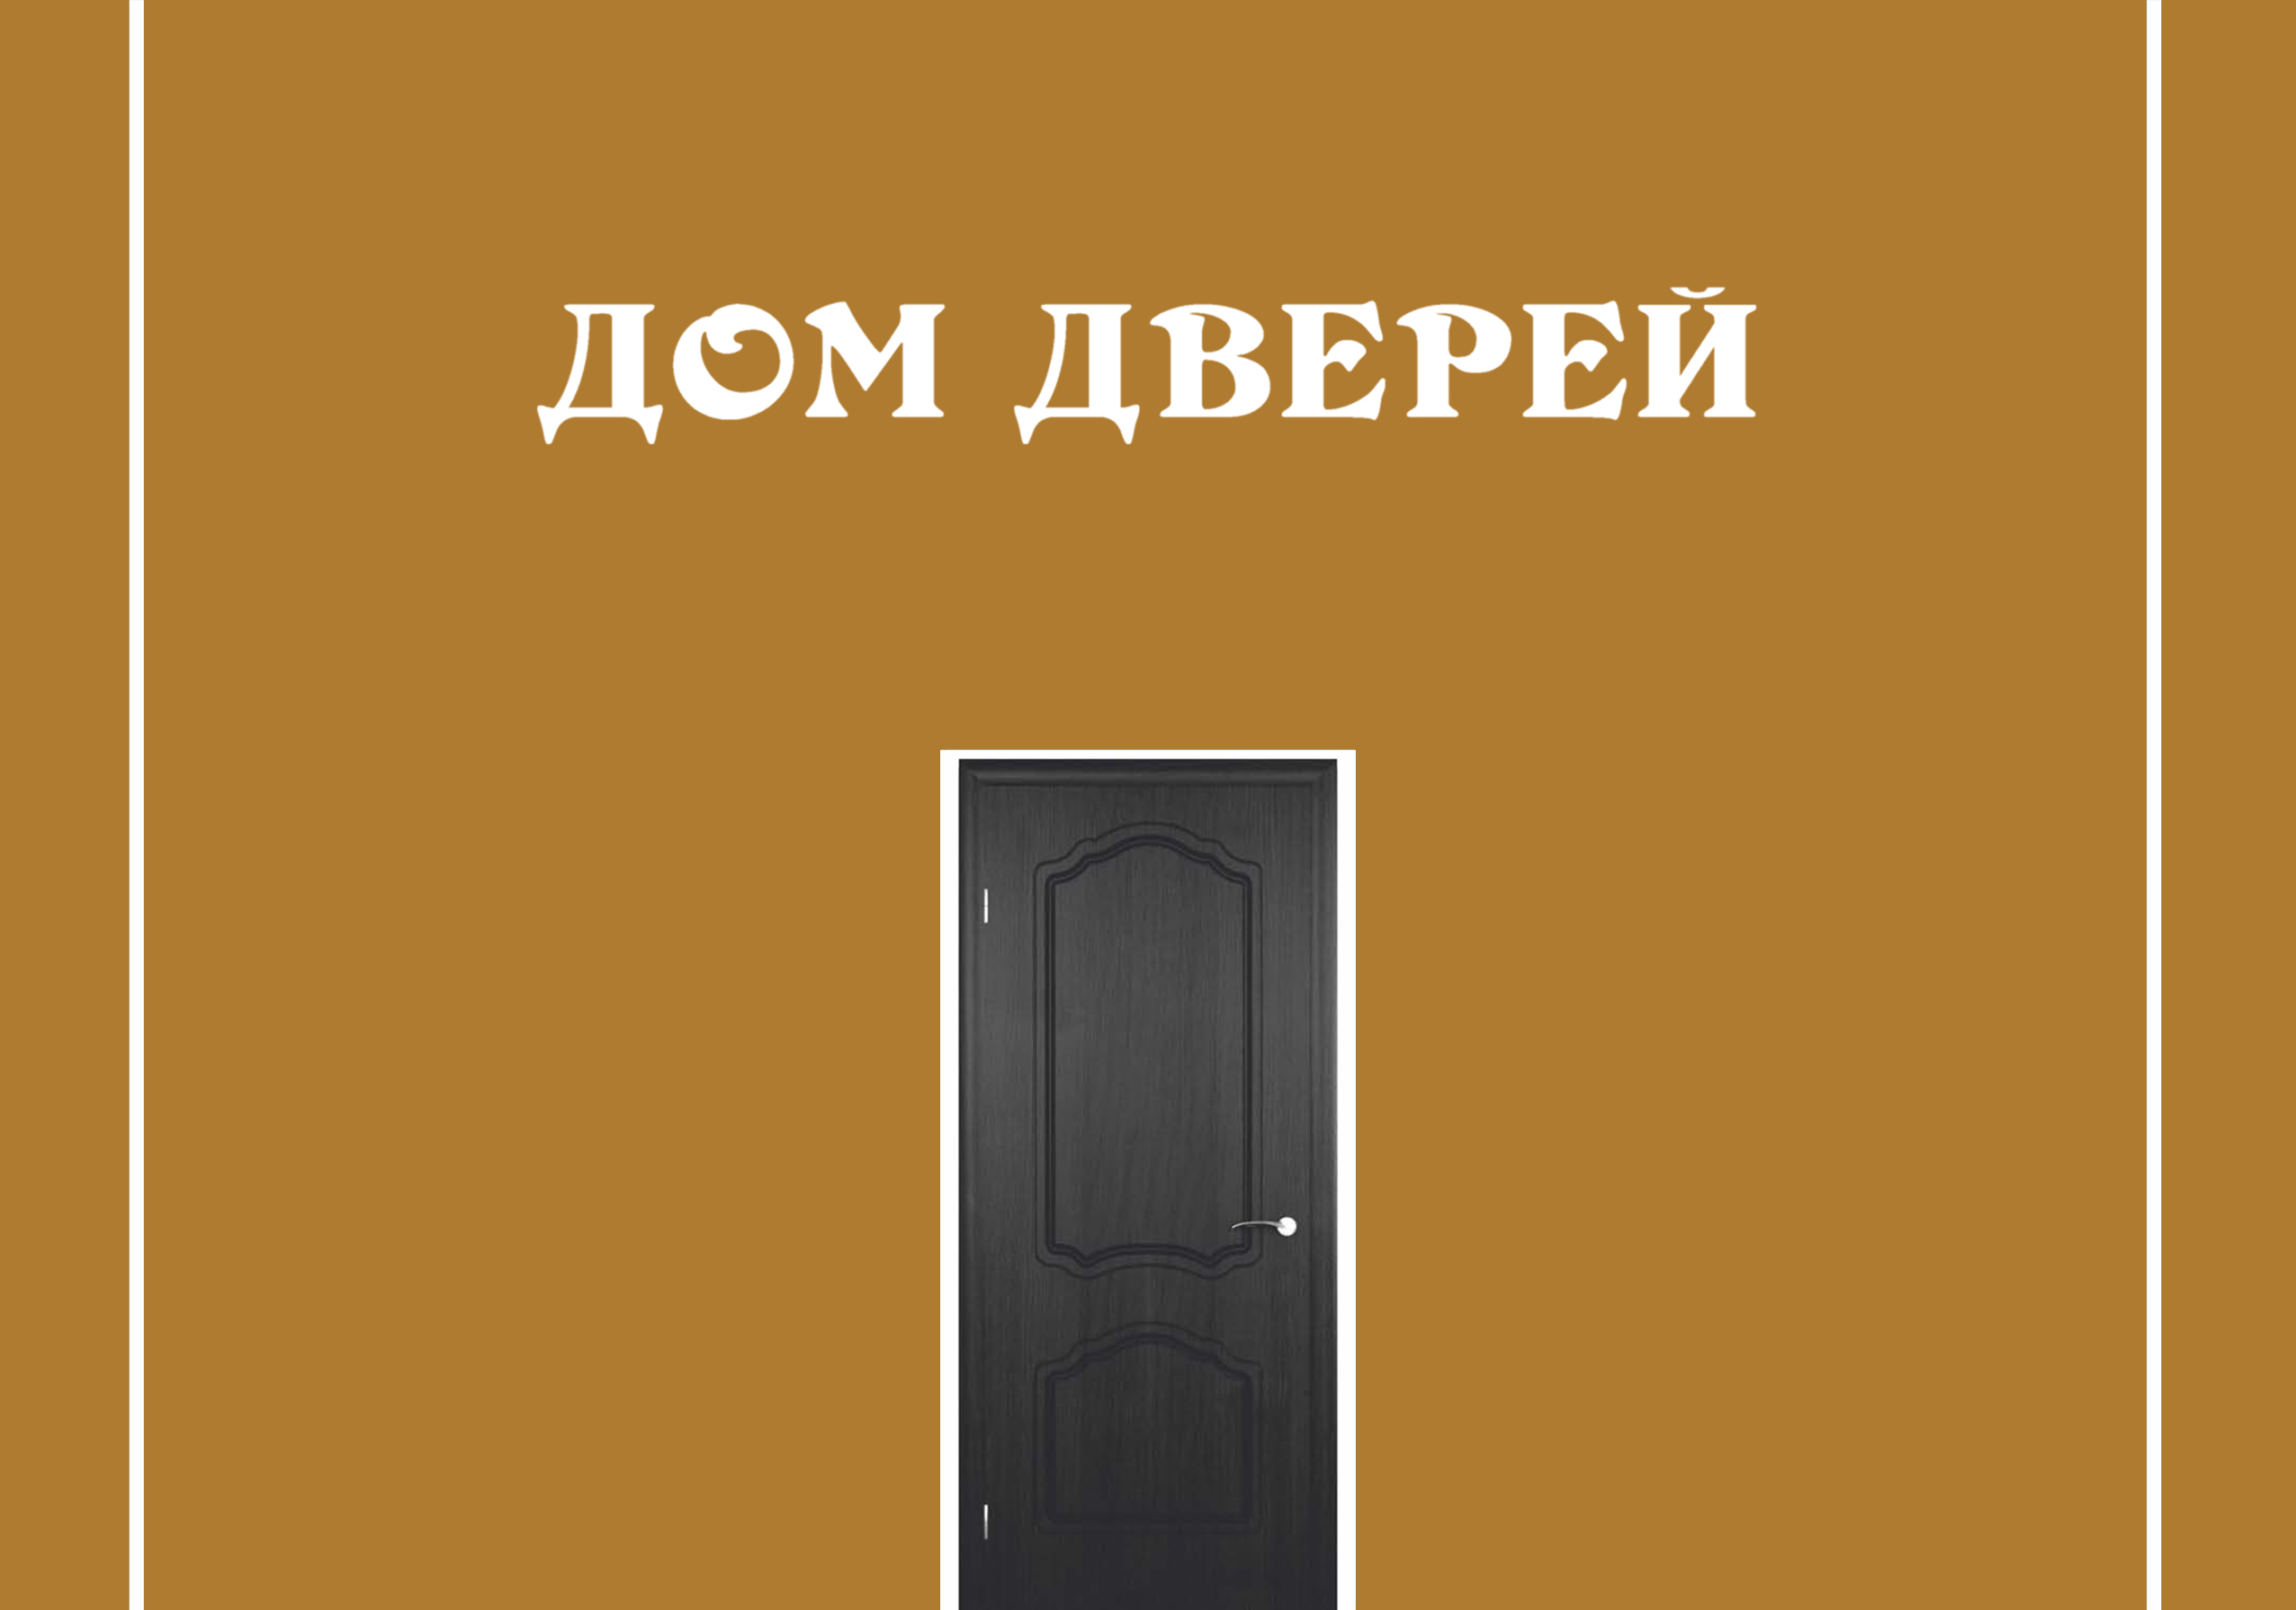 Дом дверей - каталог входных дверей